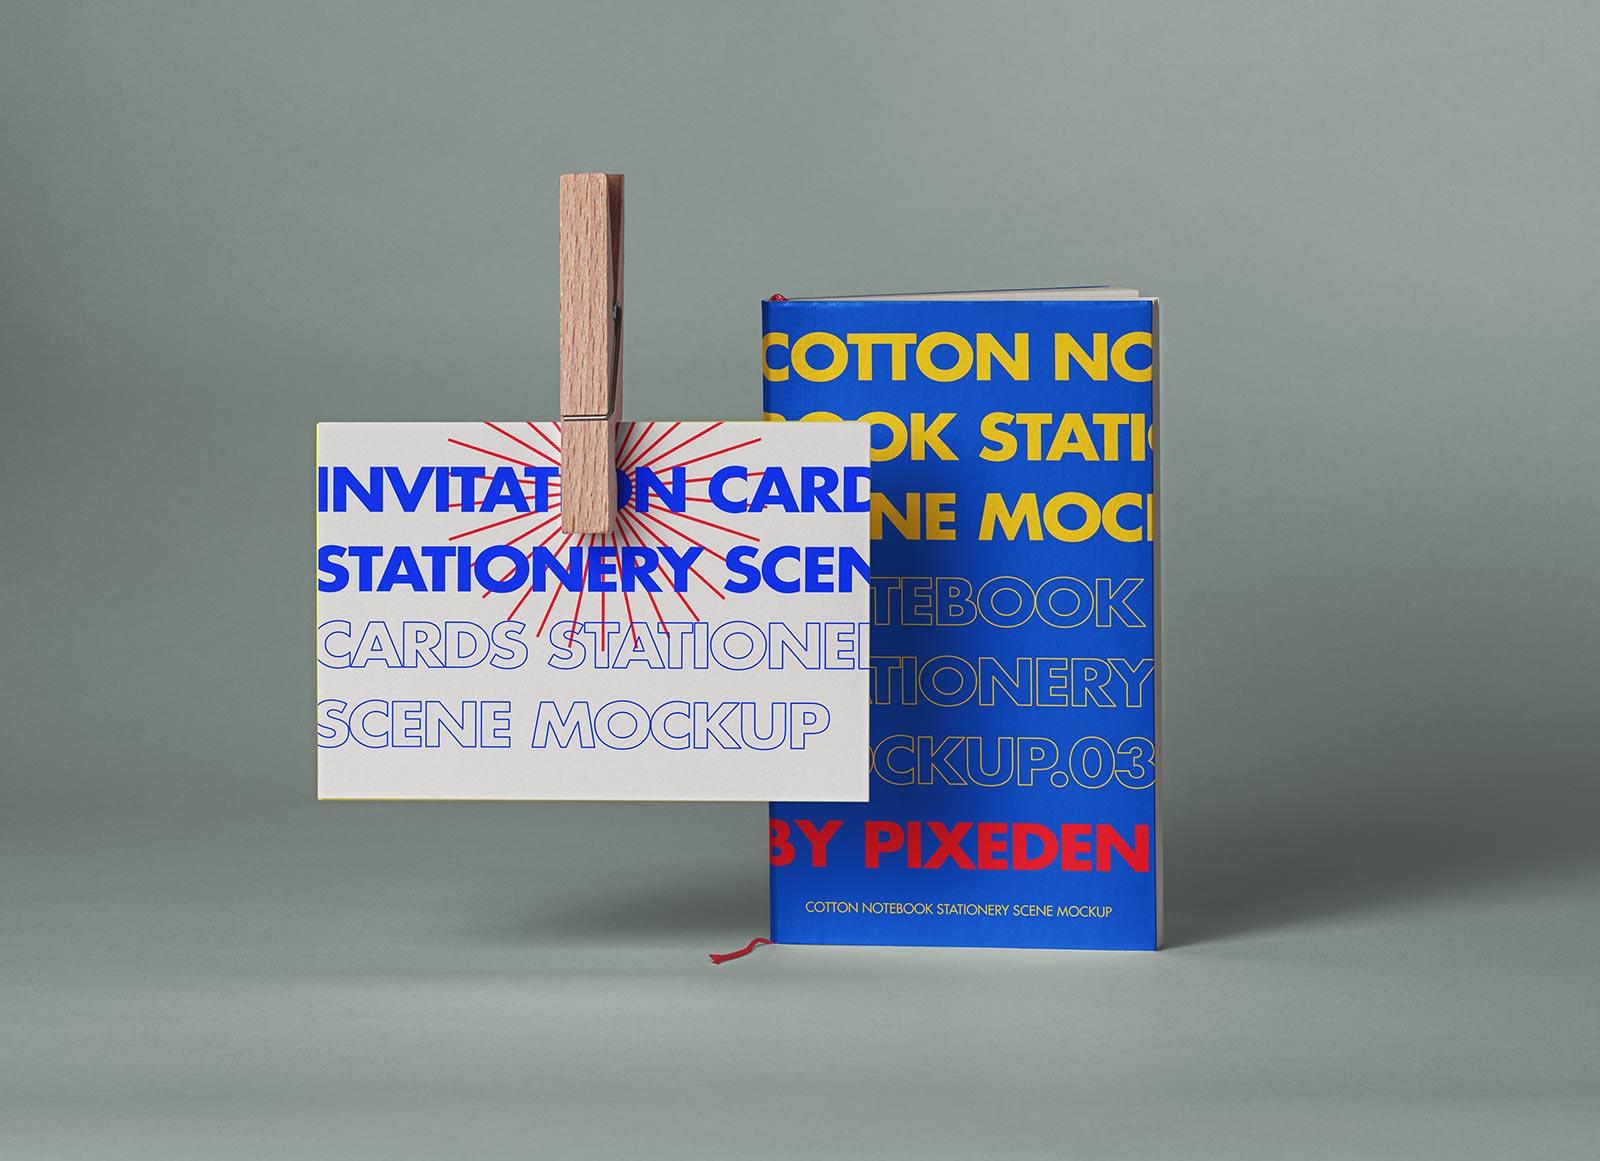 Free-Invitation-Card-&-Cotton-Notebook-Mockup-PSD